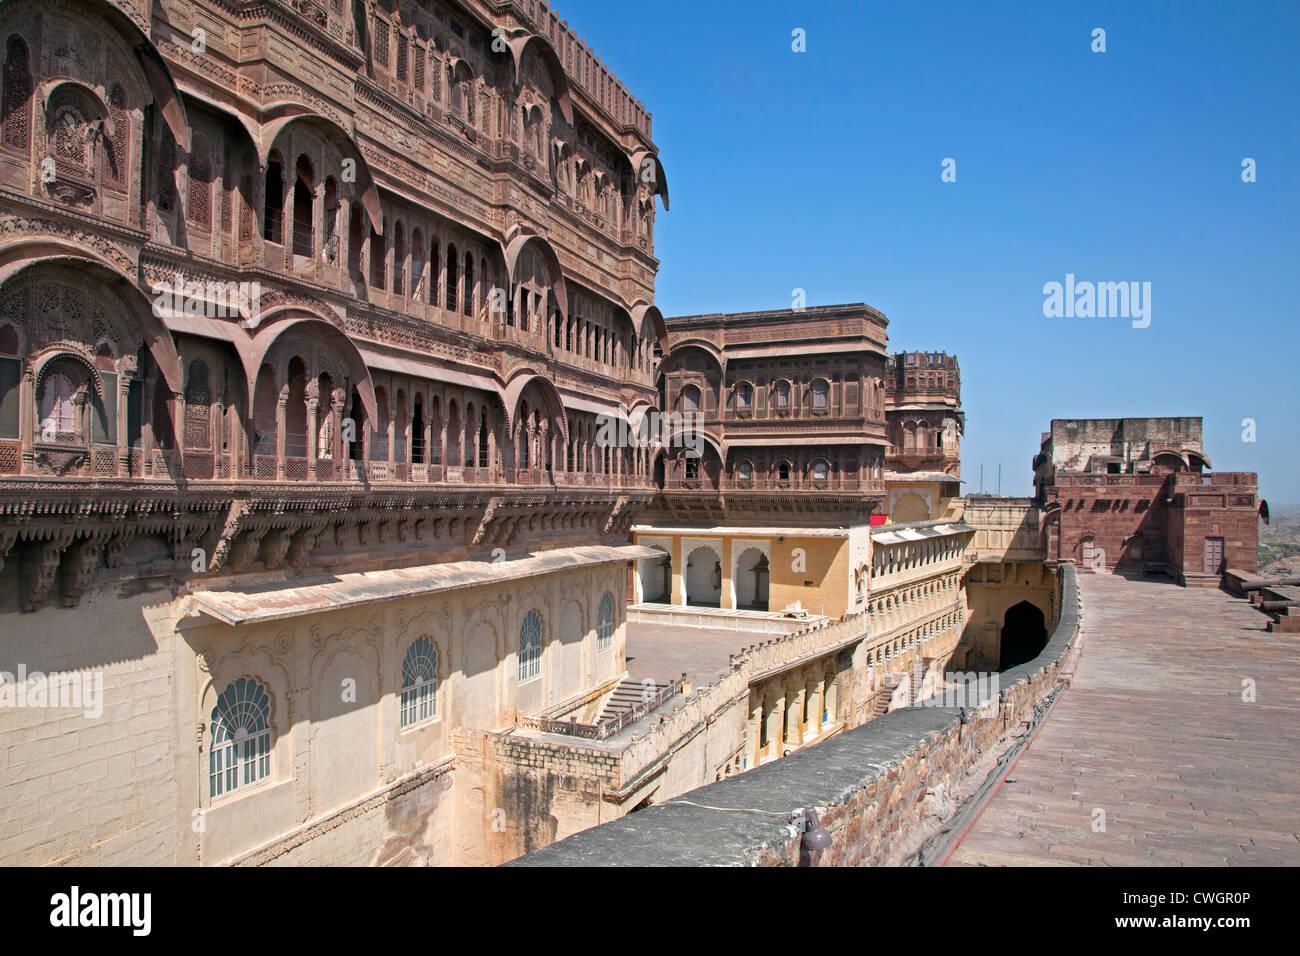 Mehrangarh Fort in Jodhpur, Rajasthan, India - Stock Image